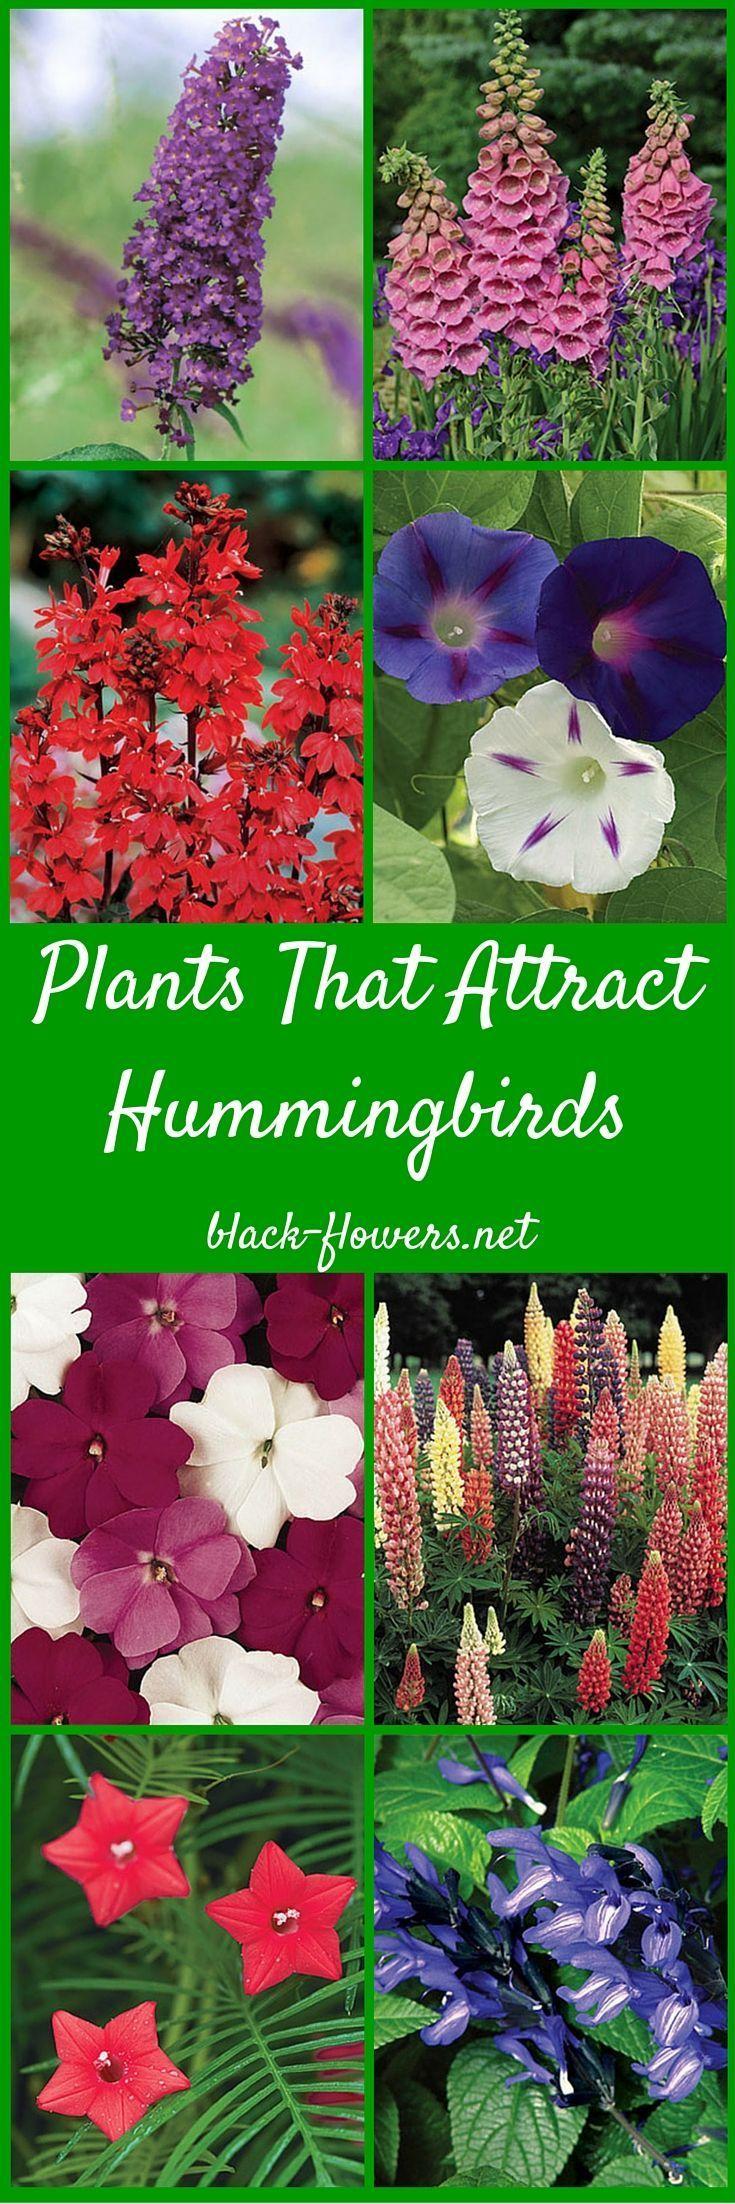 Landscape flower garden  Plants That Attract Hummingbirds  information about plants